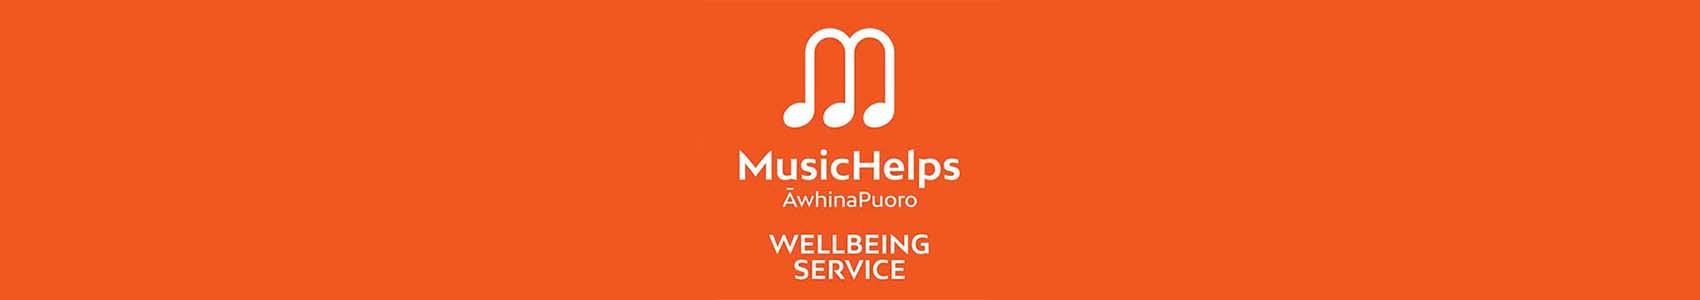 MusicHelps responds to COVID-19